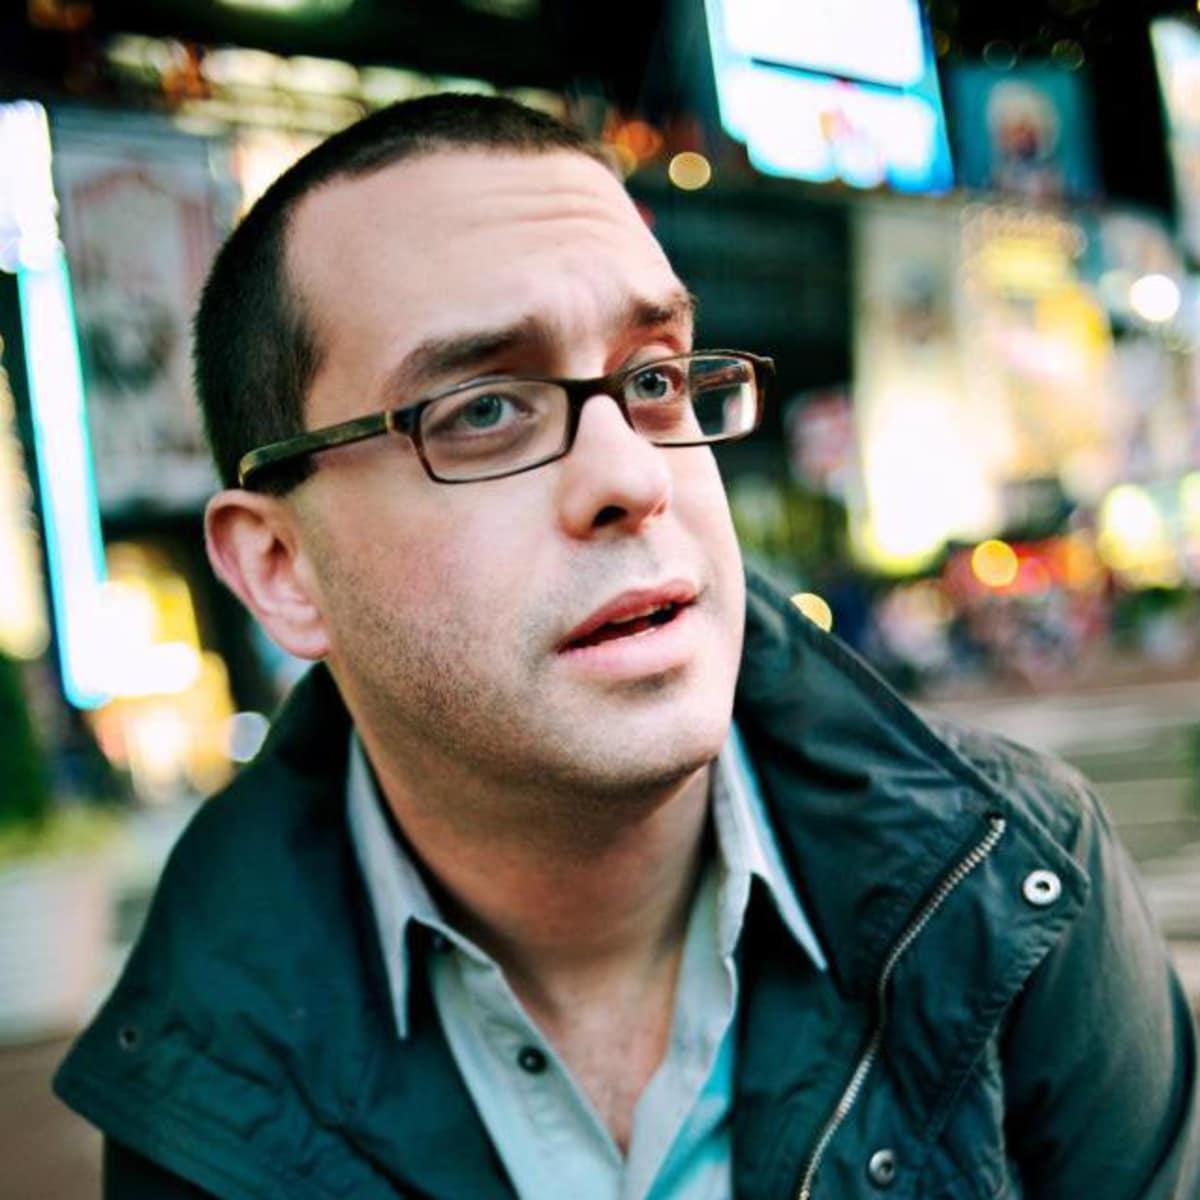 Comedian Joe DeRosa